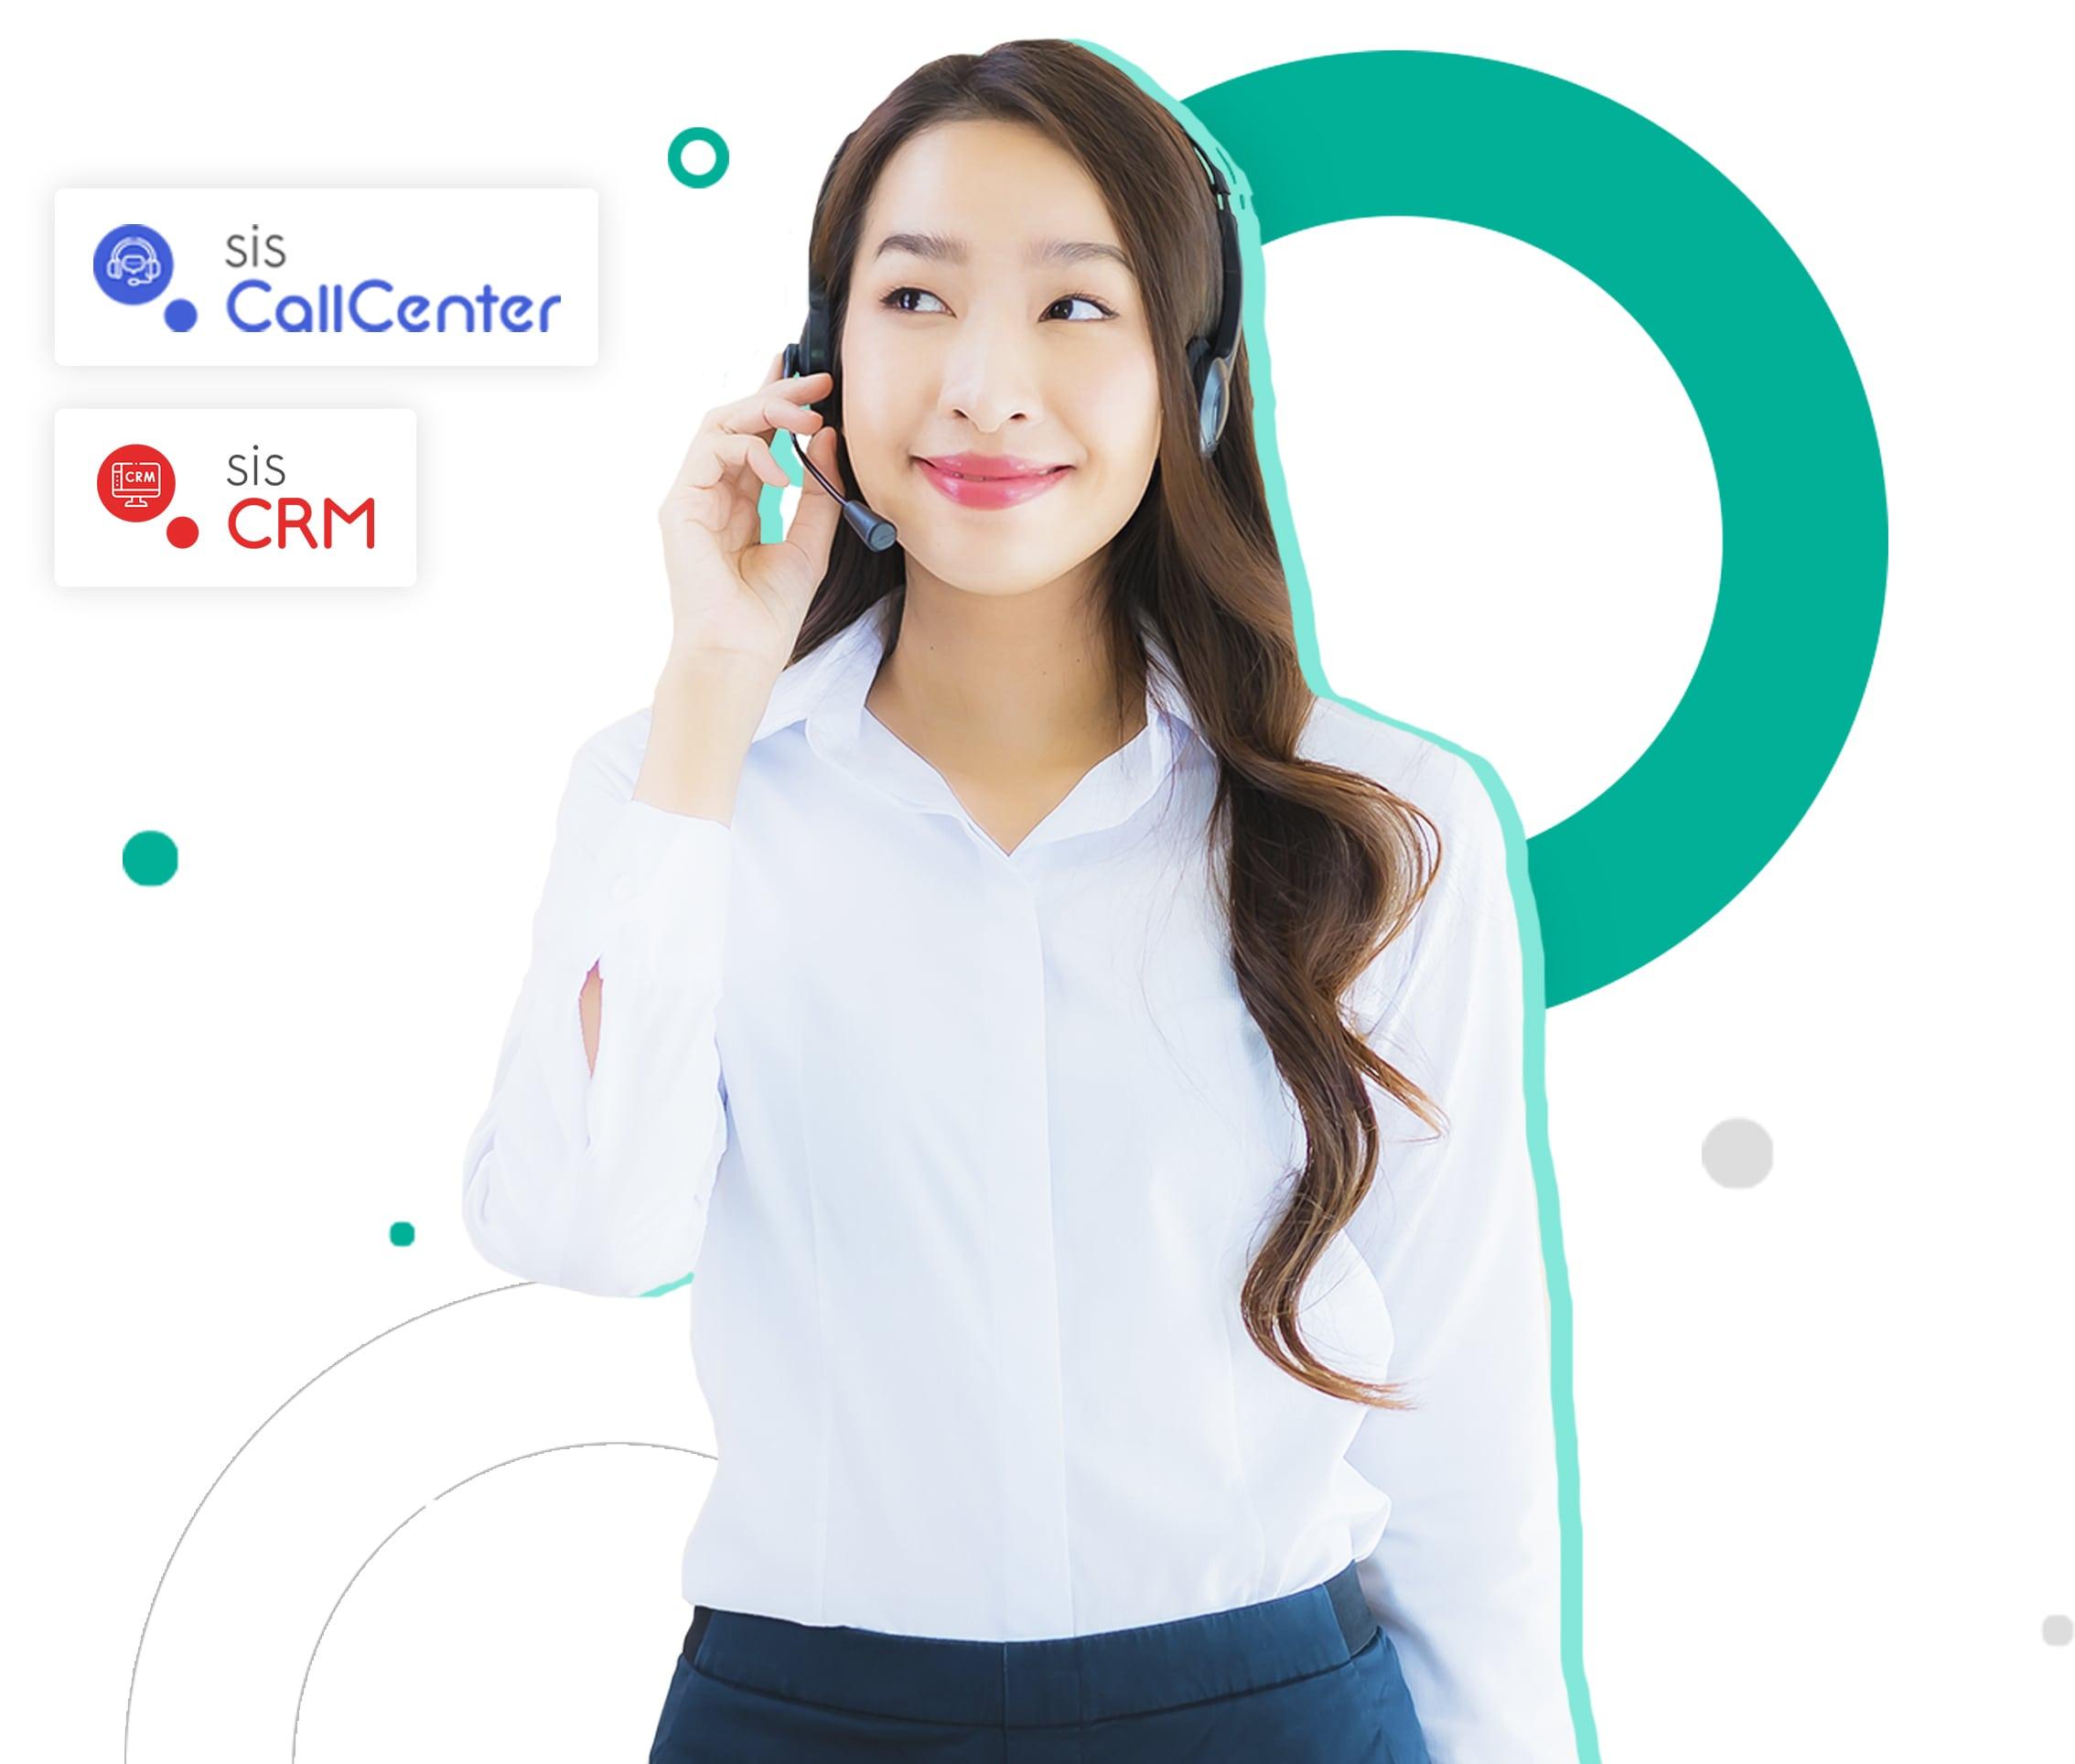 Sistemas Call Center Pluri Sistemas. CRM e Discador Automático. CRM + Call Center